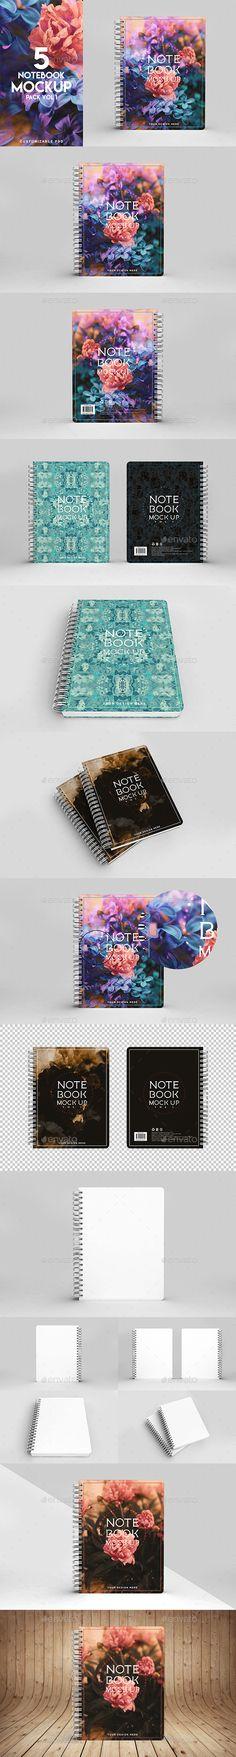 Notebook Mockup Vol 1